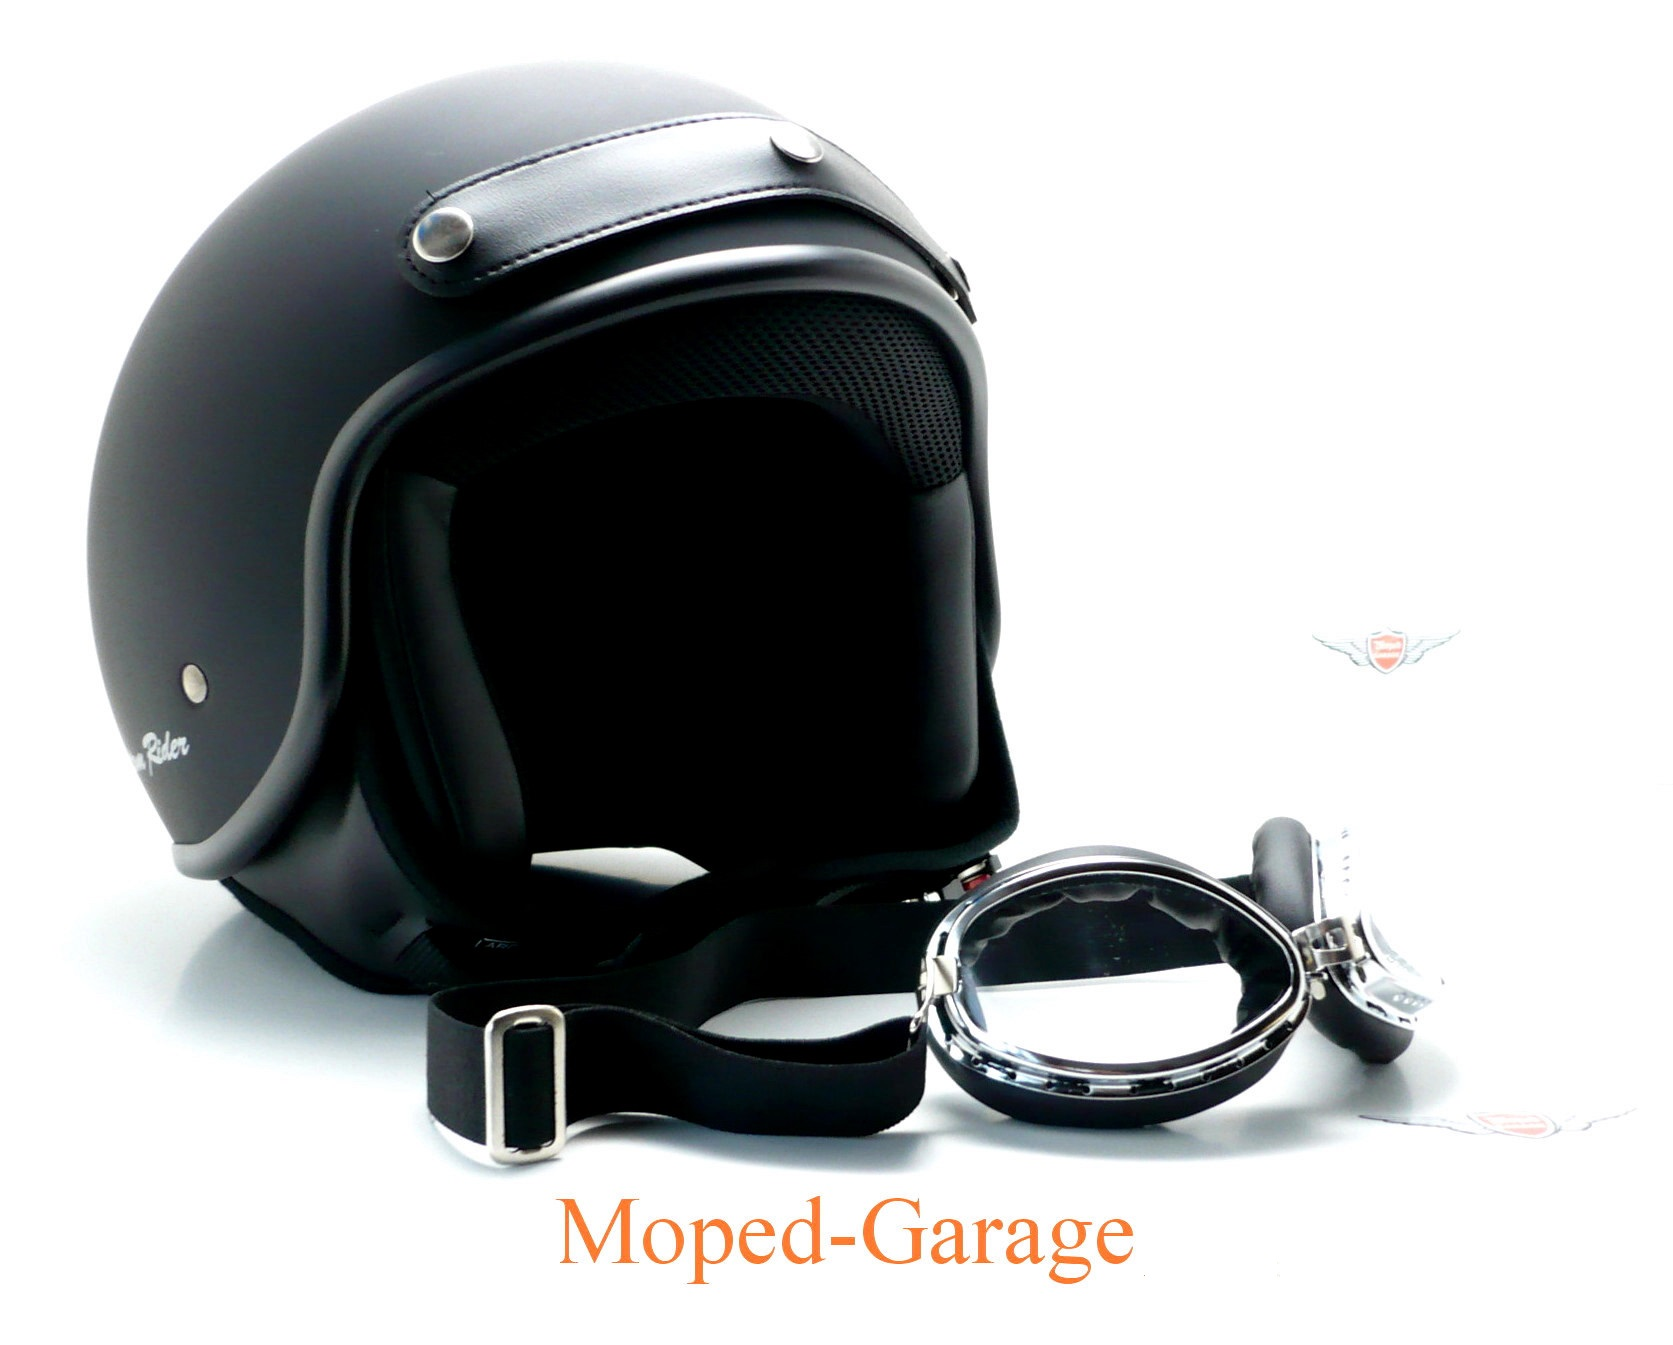 moped motorrad classic chopper jet helm. Black Bedroom Furniture Sets. Home Design Ideas